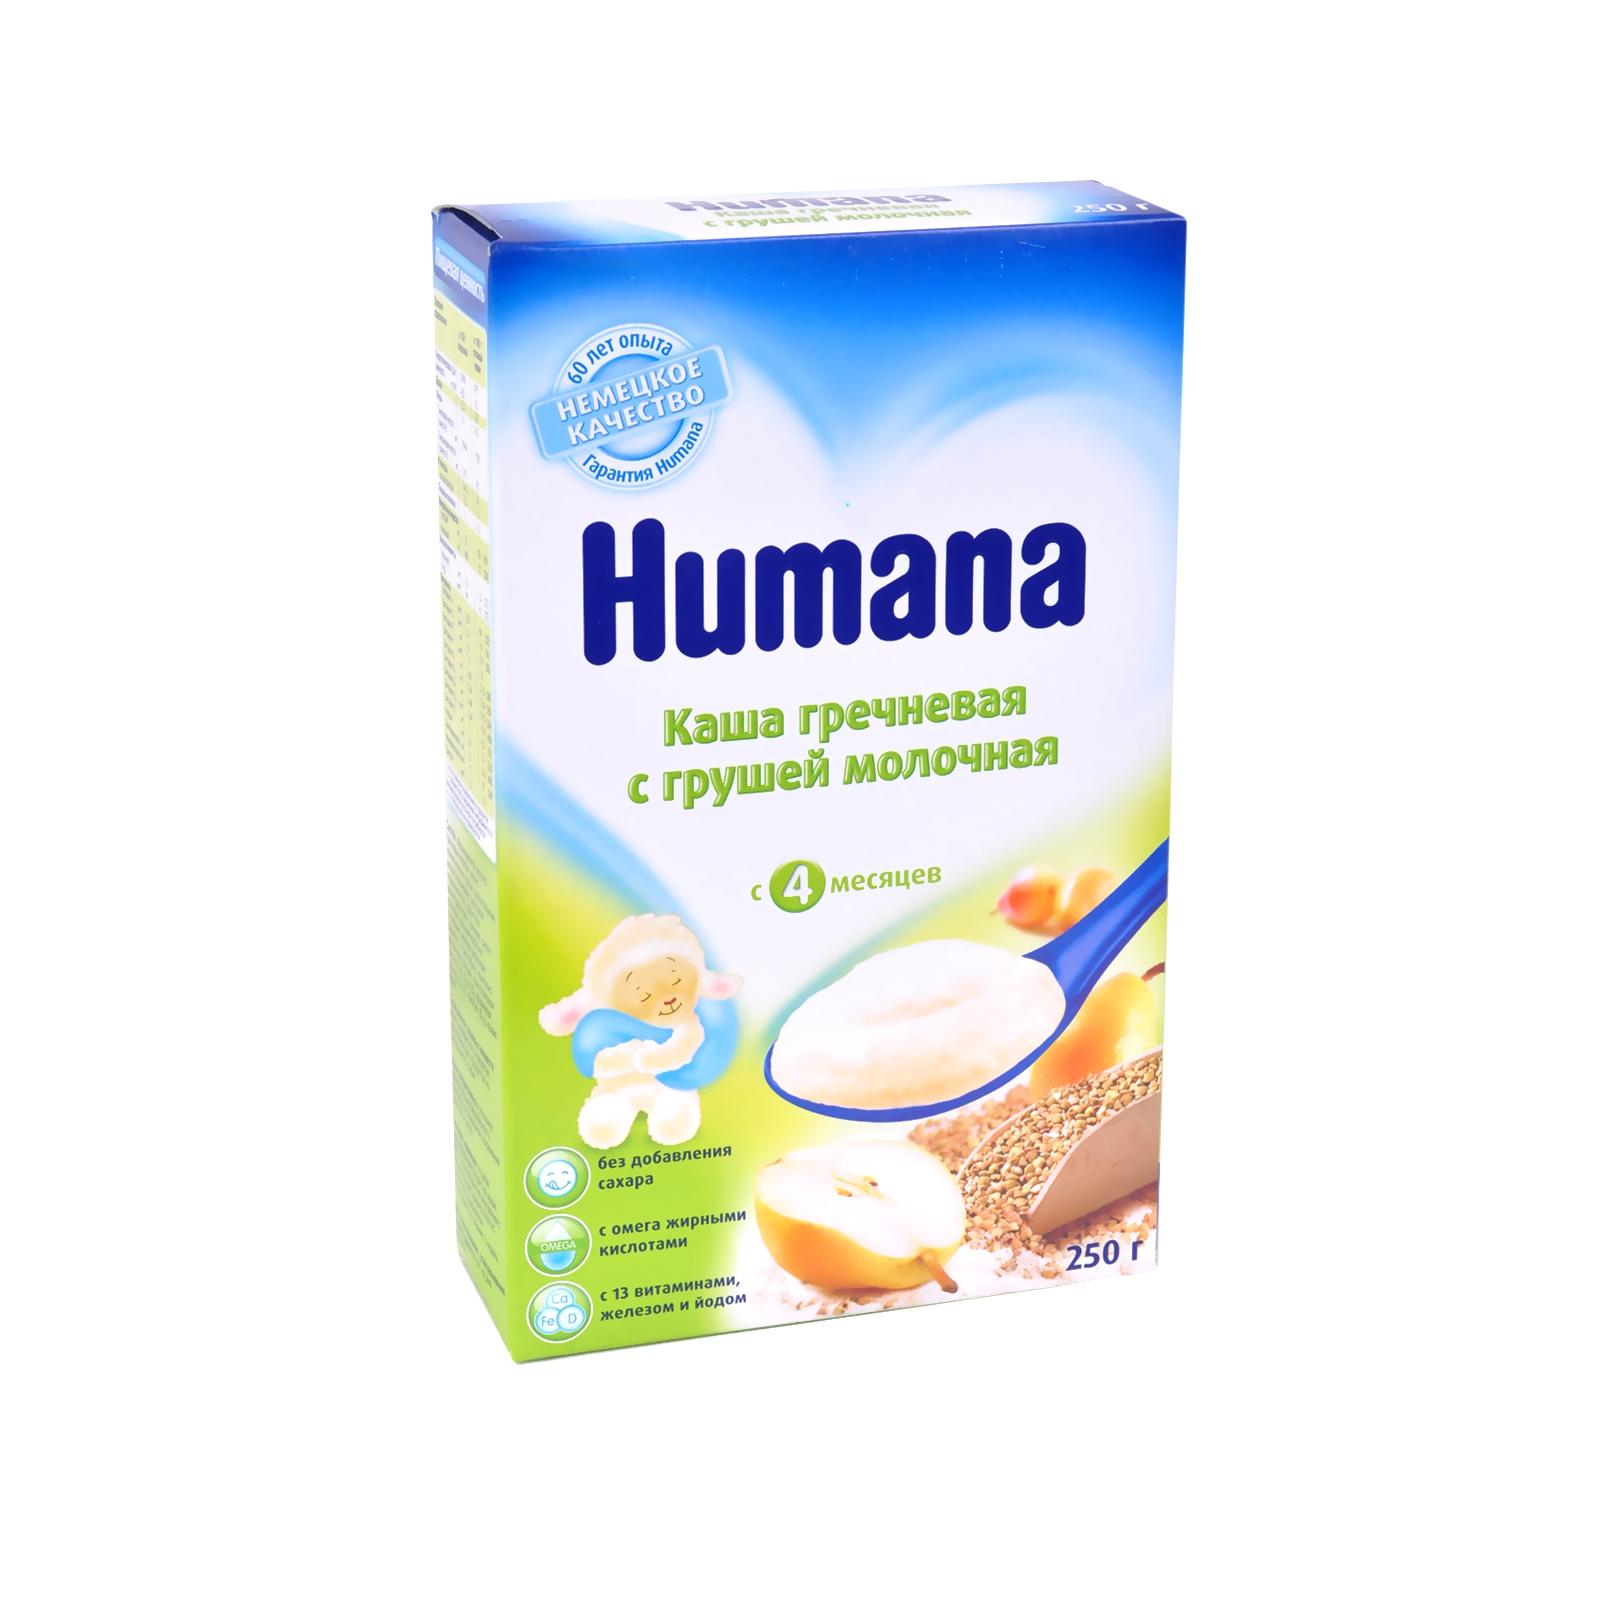 ���� Humana �������� 250 �� ��������� � ������ (� 4 ���)